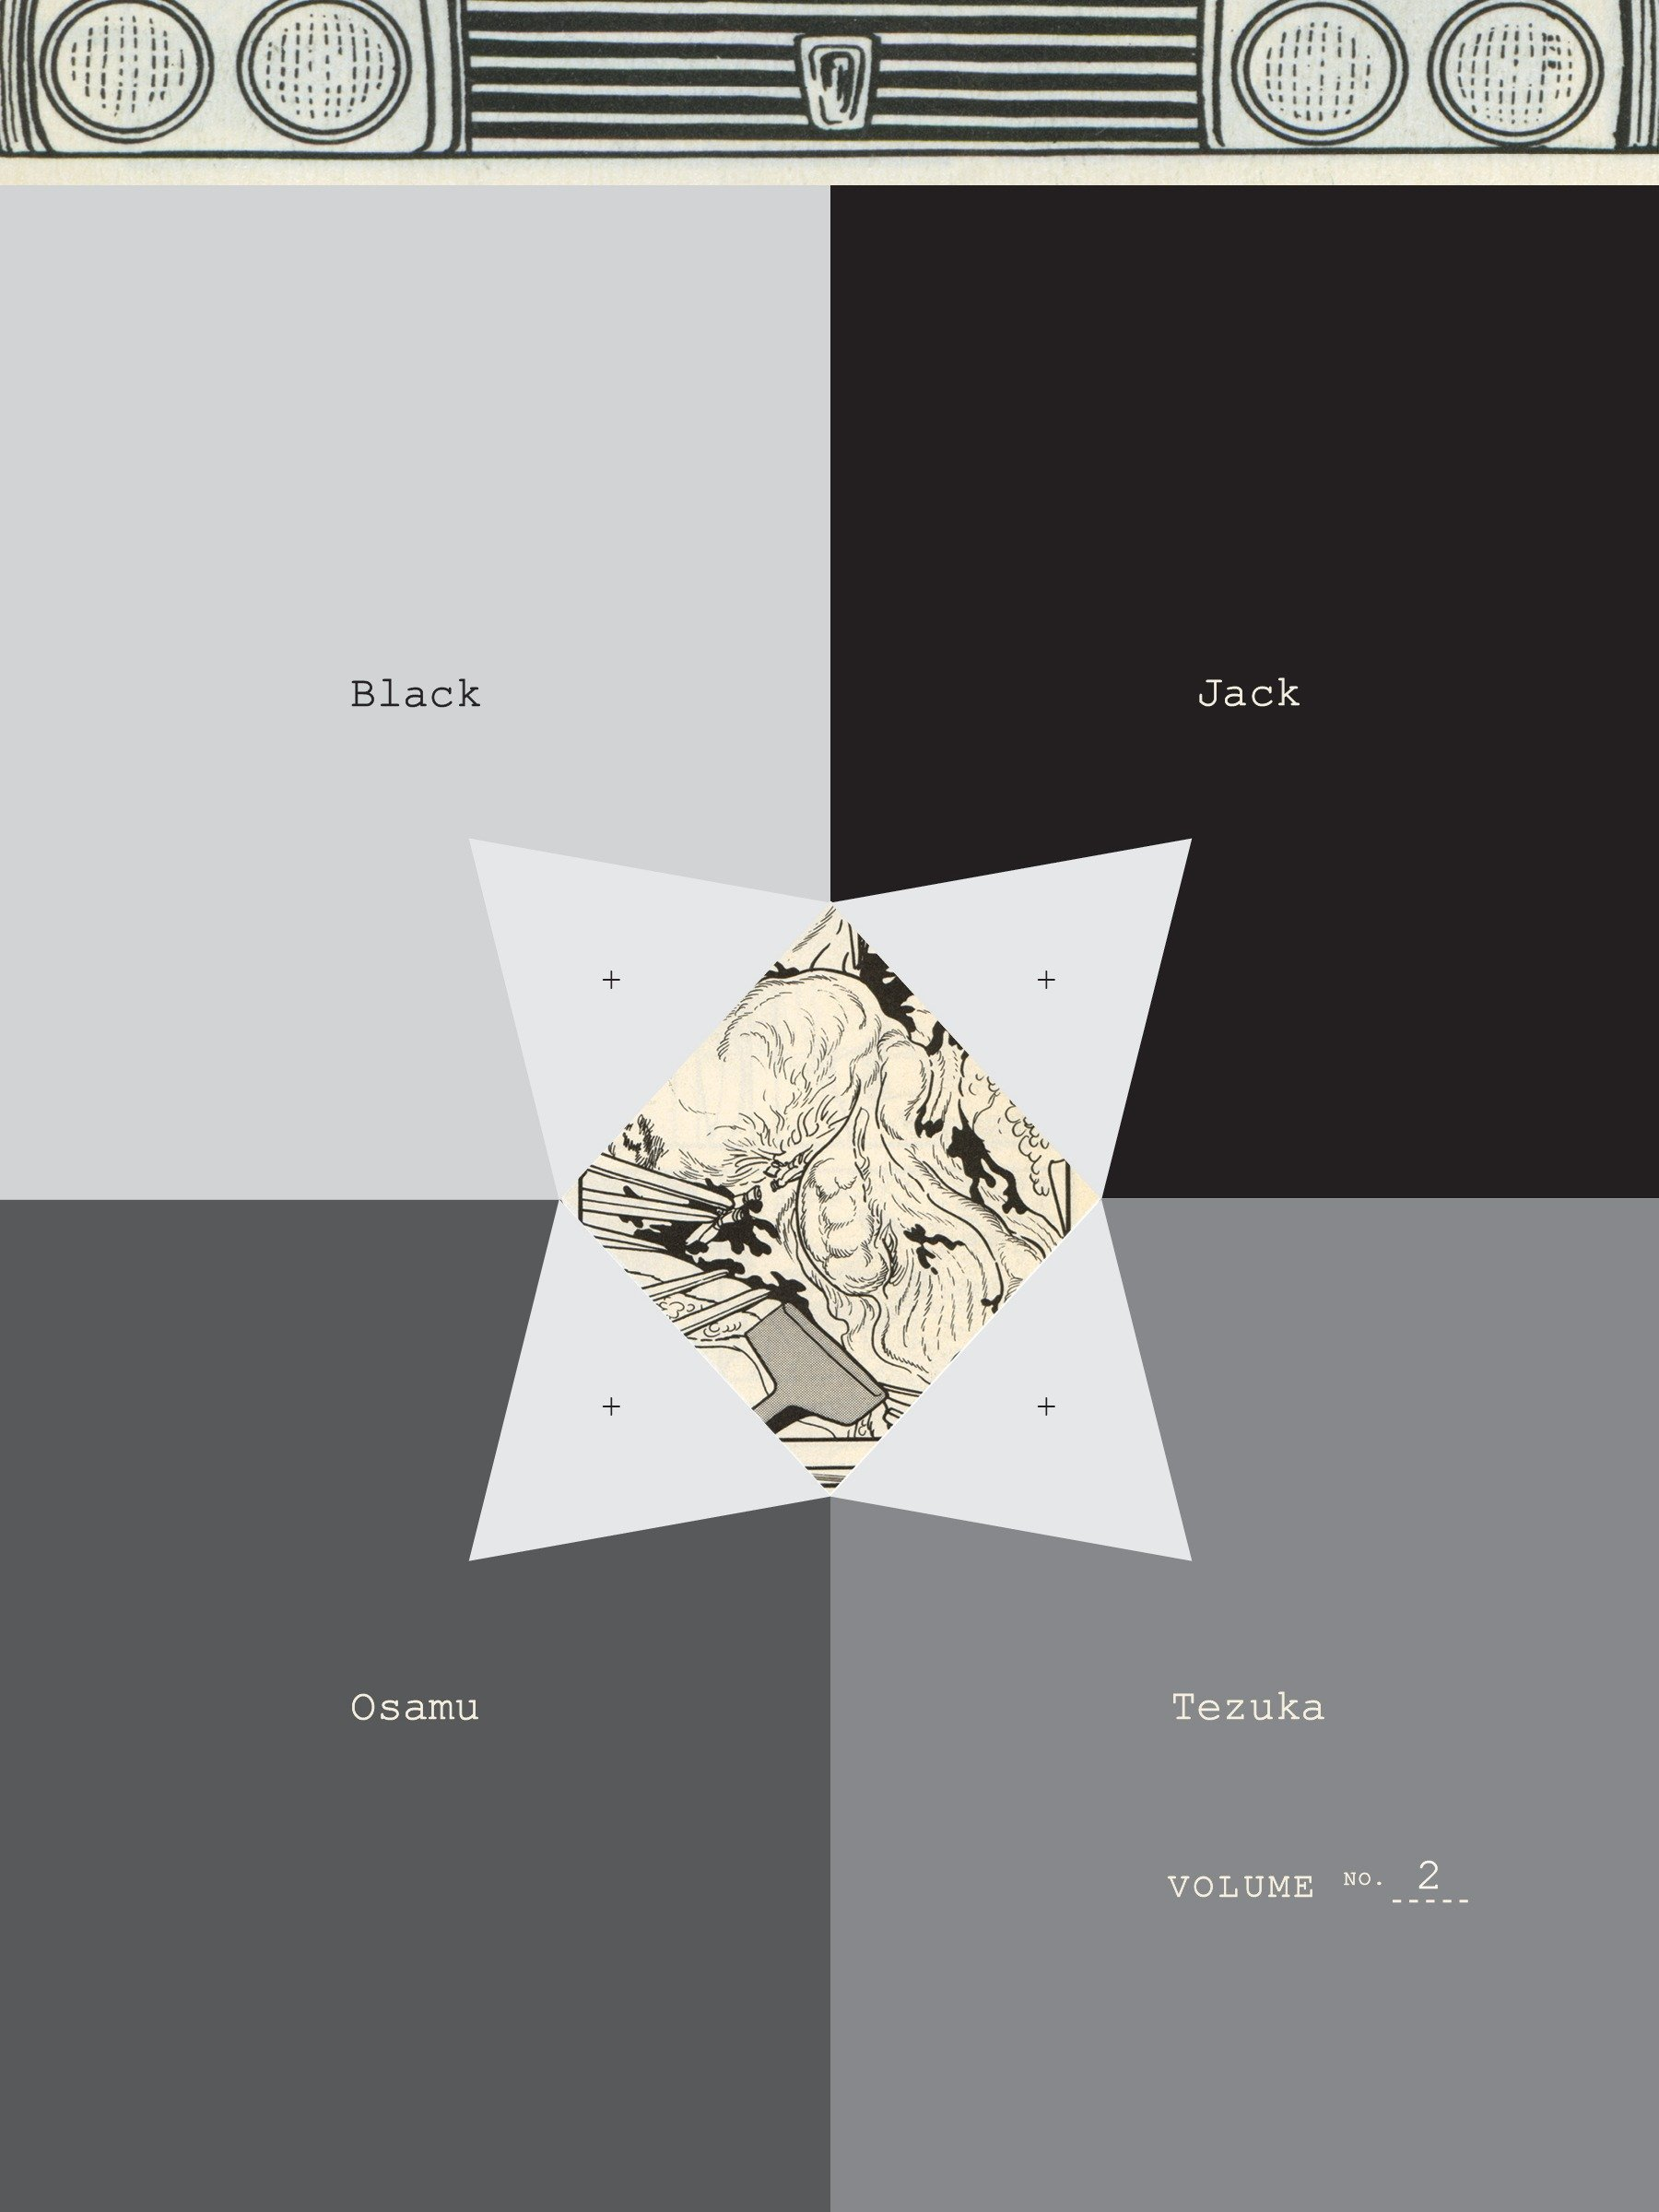 Black jack liczenie kart hi-lo